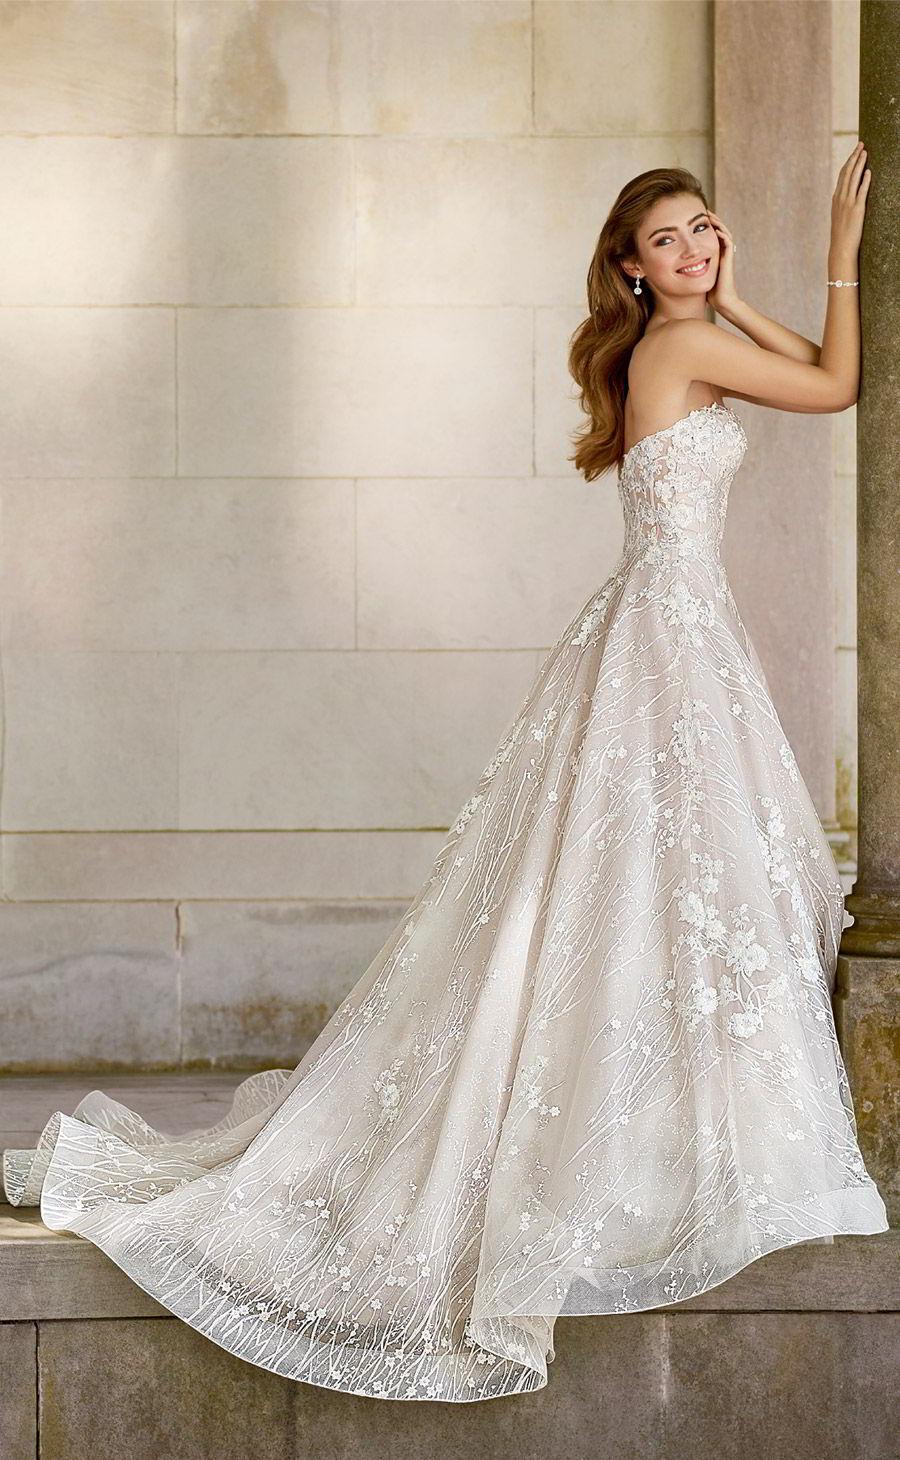 elegant strapless dresses photo - 1